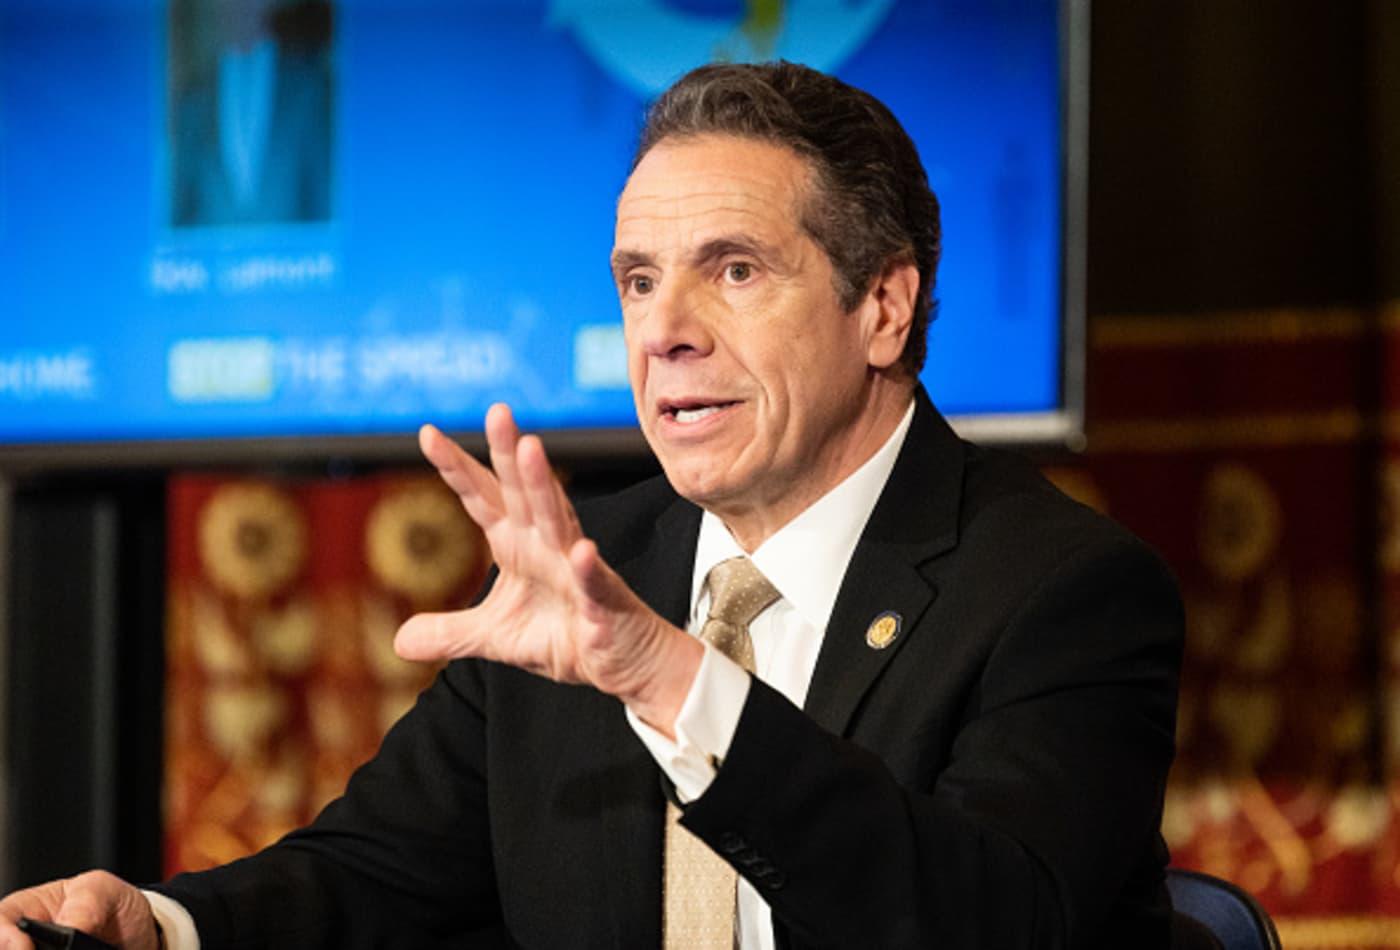 New York antibody study estimates 13.9% of residents have had the coronavirus, Gov. Cuomo says